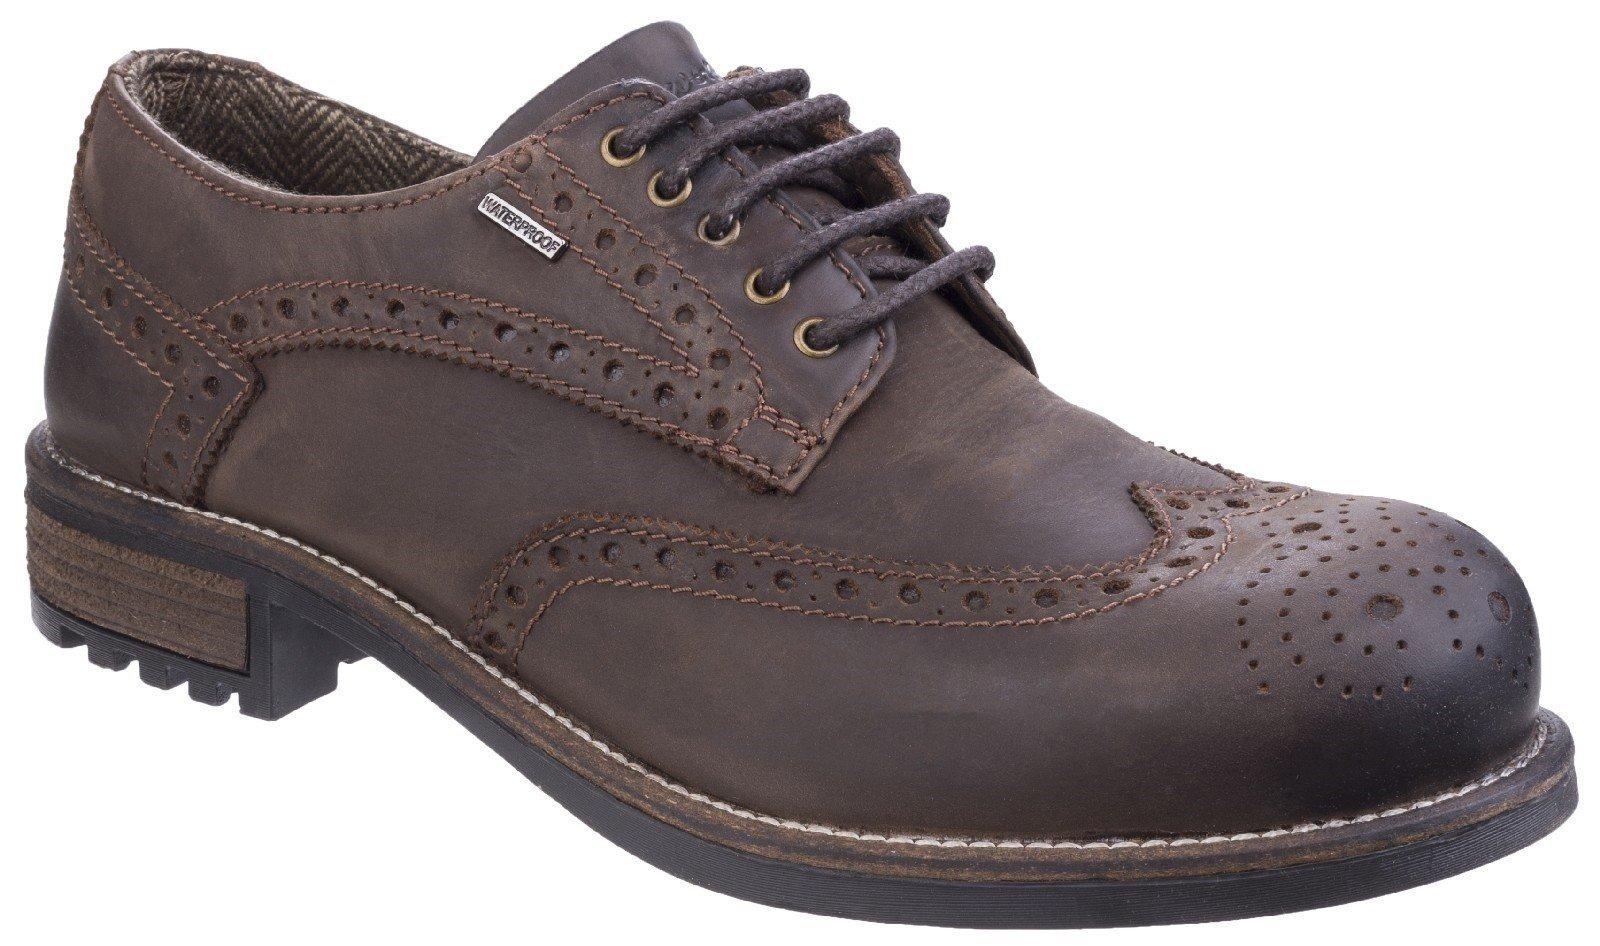 Cotswold Men's Oxford Shoe Brown 24933 - Brown 6